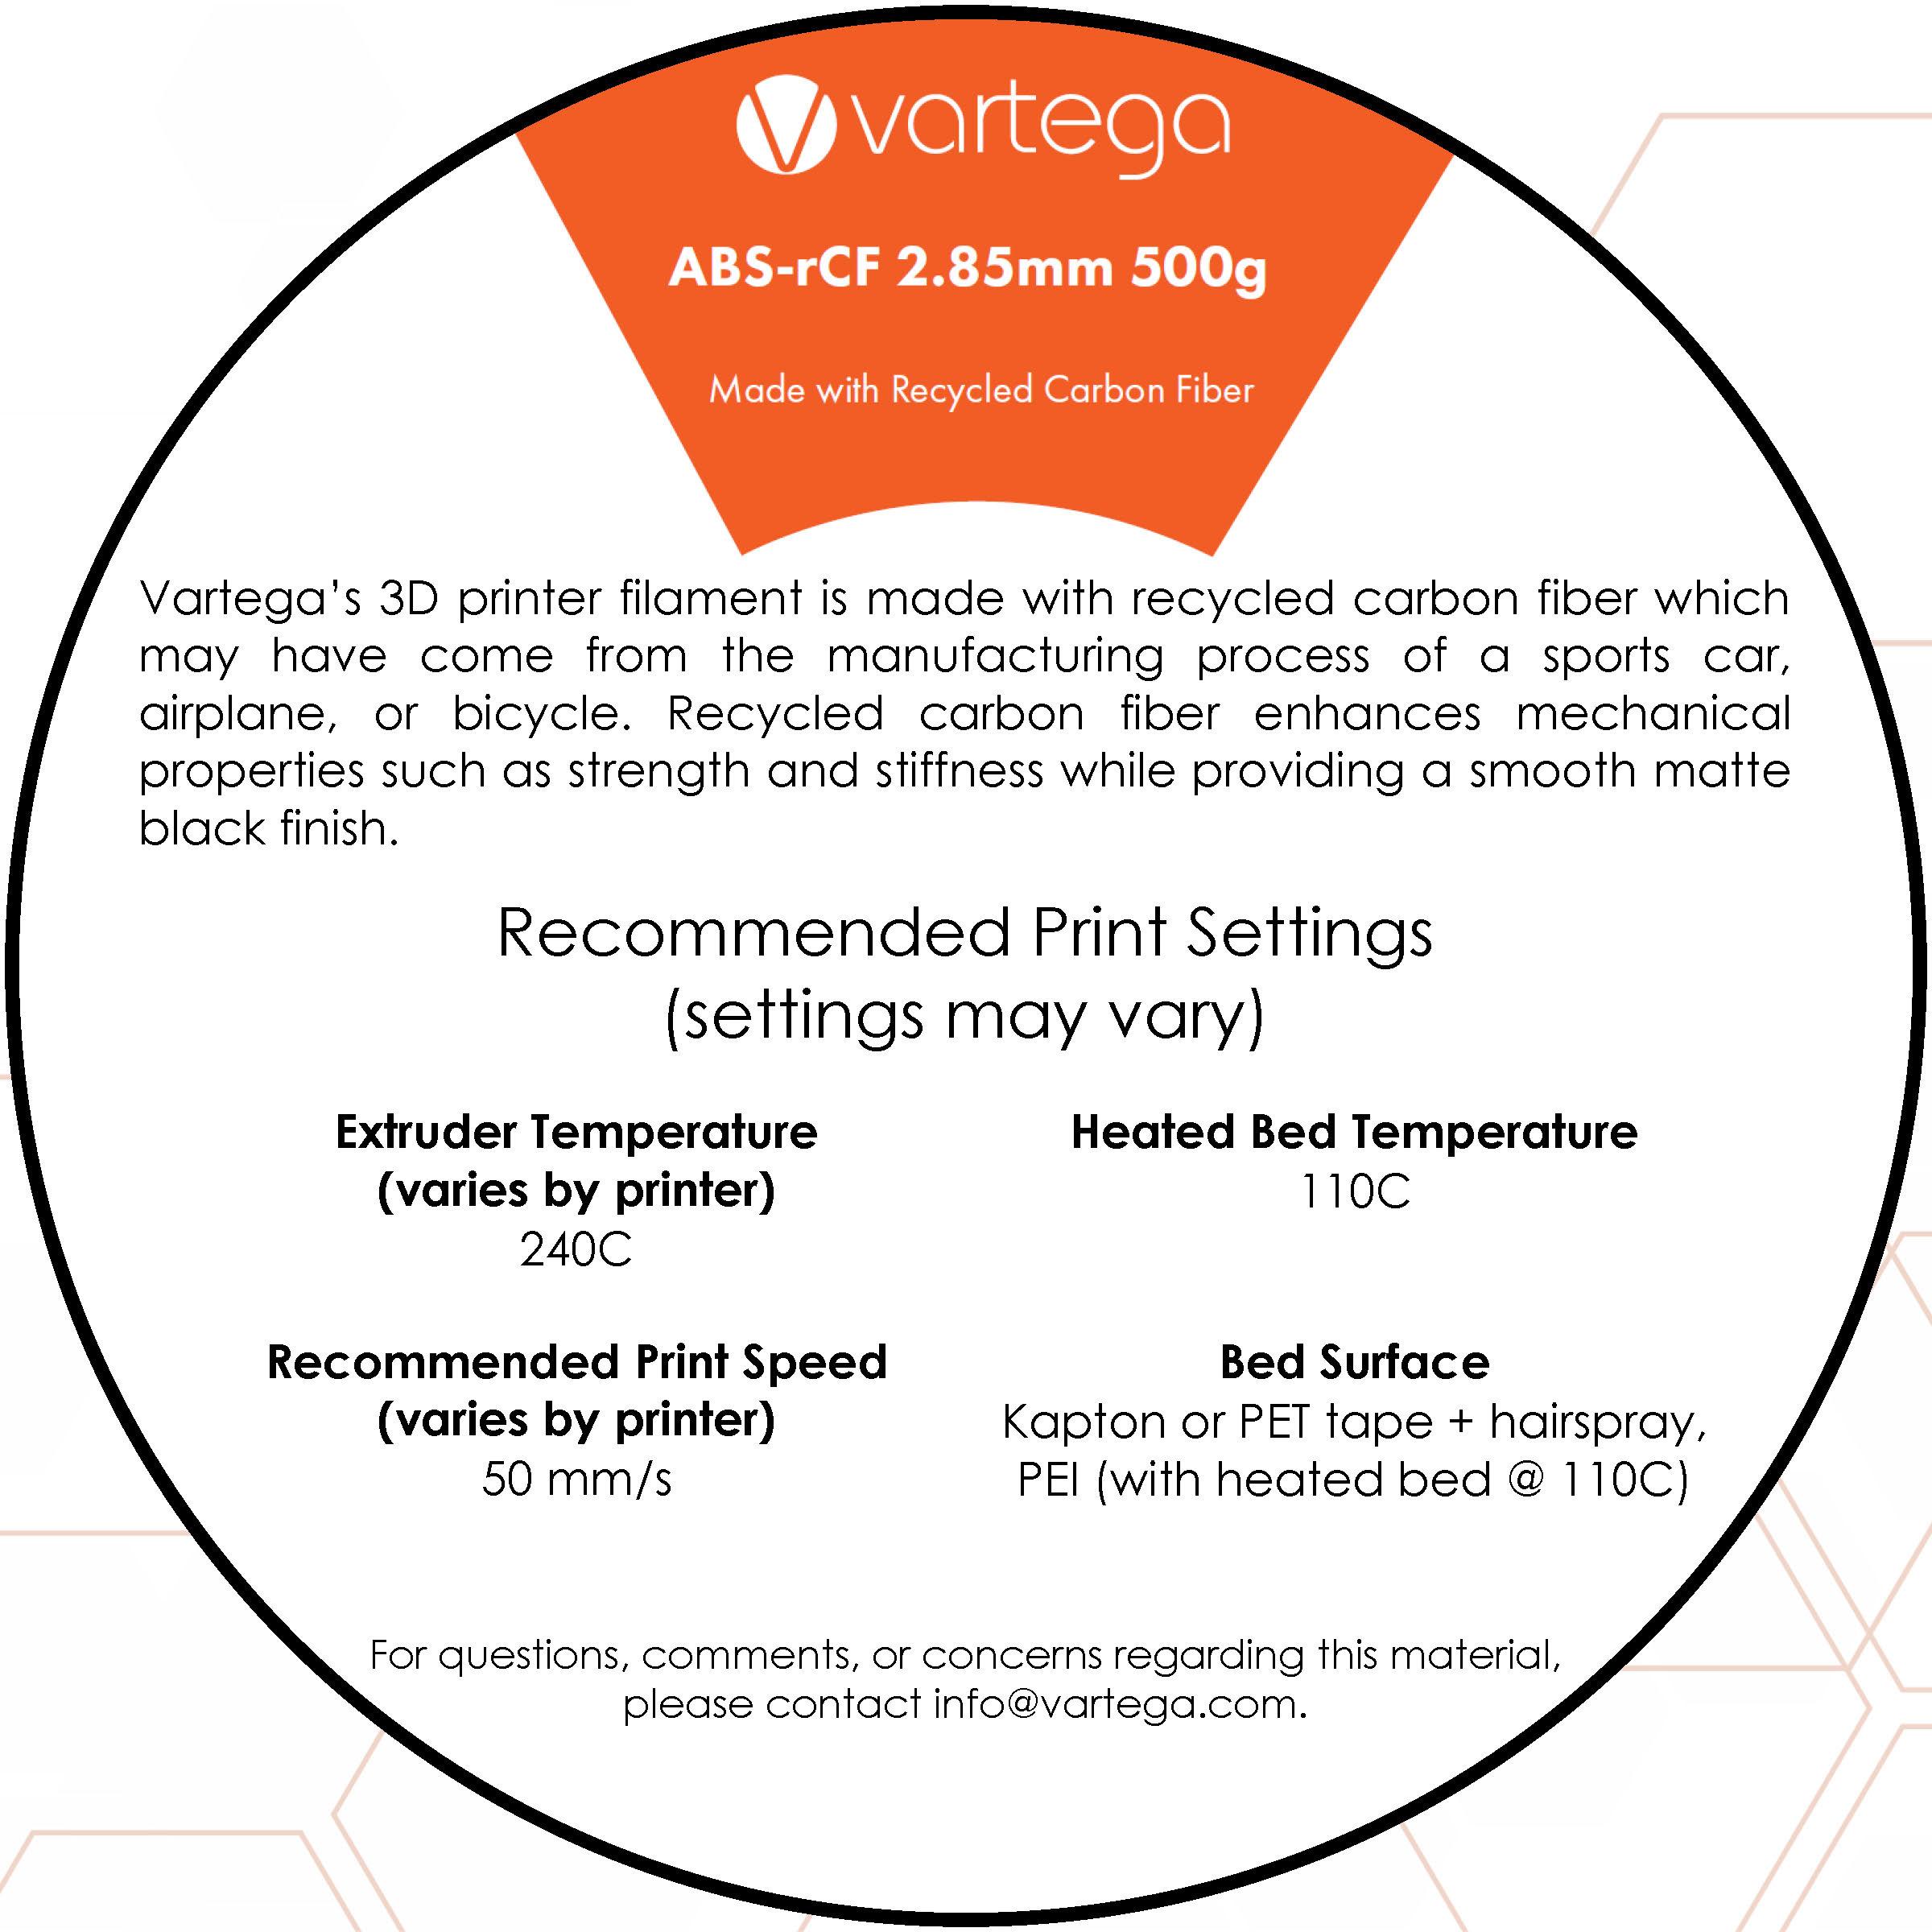 Vartega ABS Instruction Card